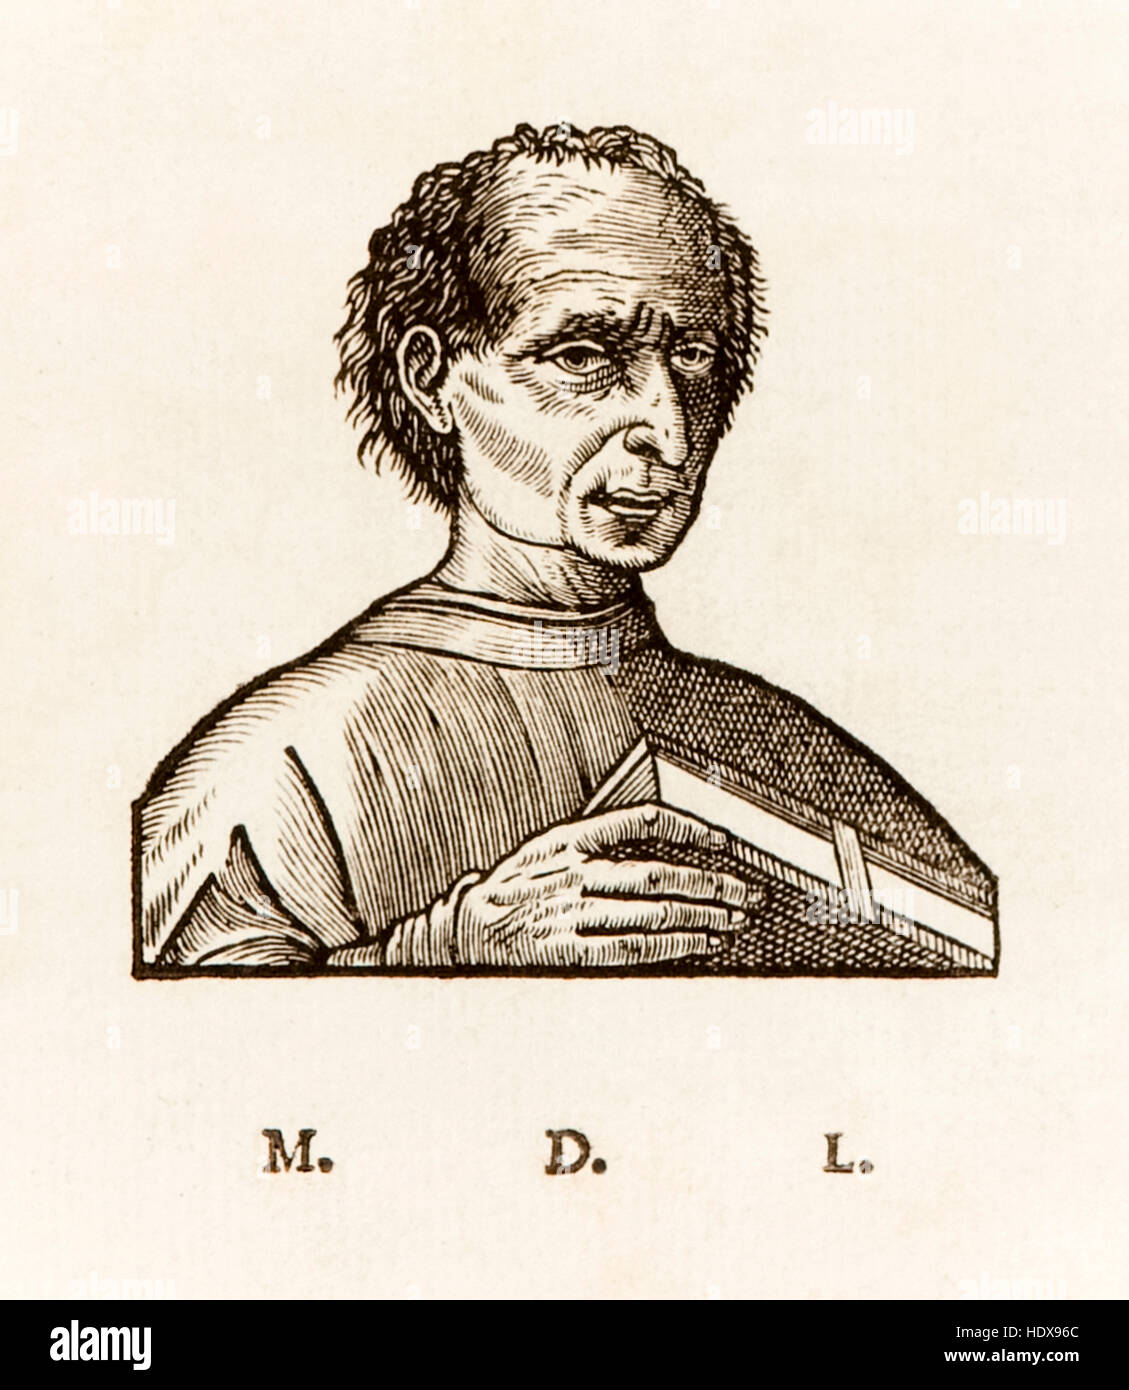 Niccolò Machiavelli (1469-1527) escritor político do Renascimento italiano, xilogravura retrato de 1550 Imagens de Stock